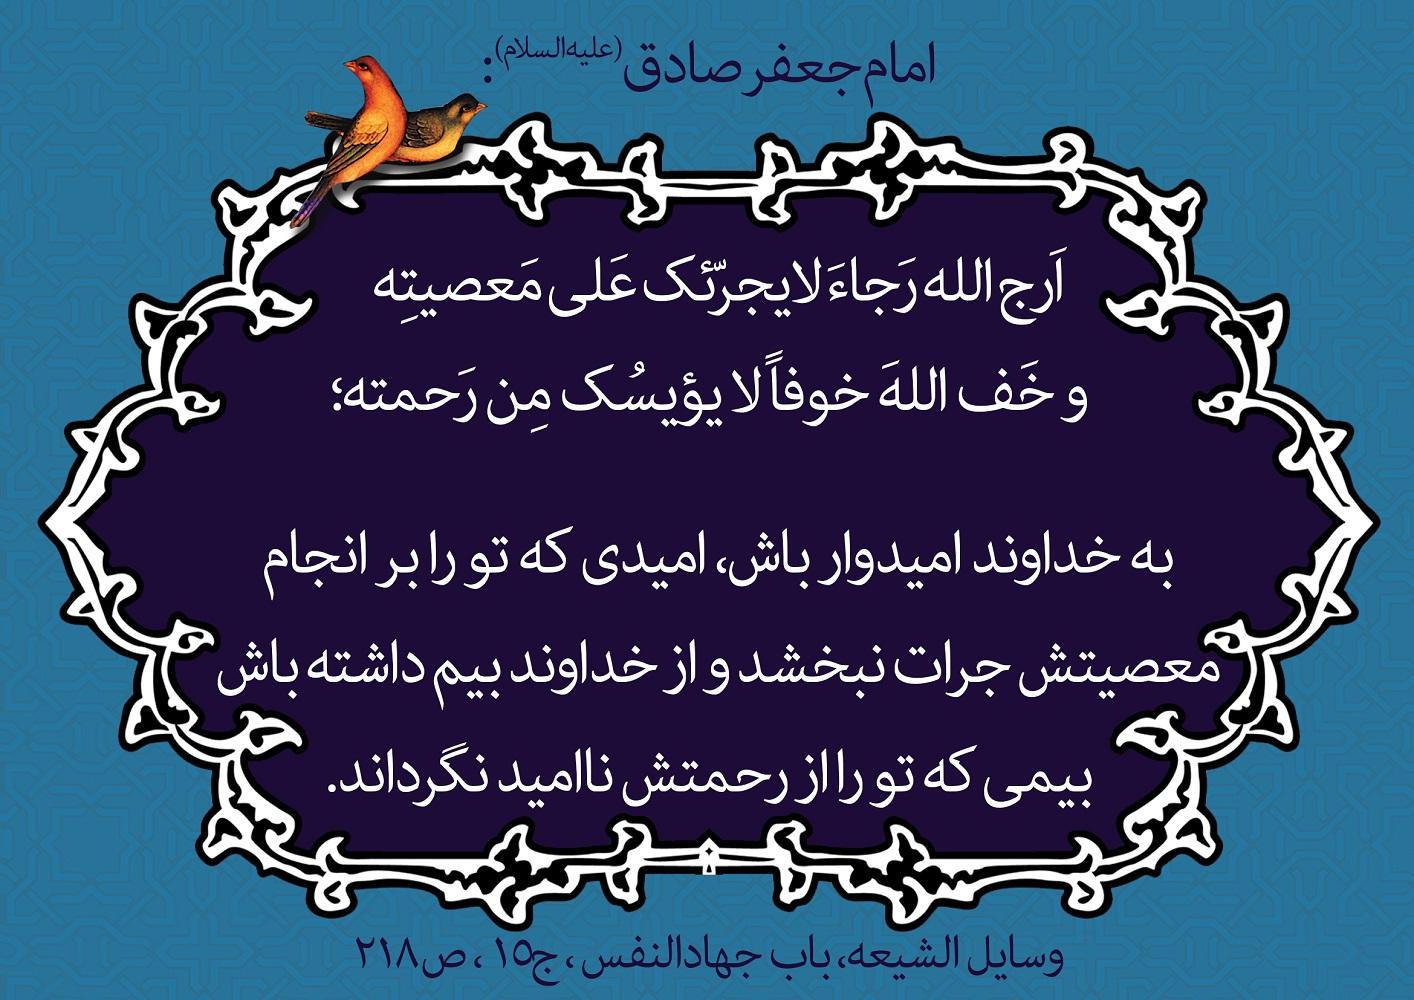 http://uupload.ir/files/1jn0_00160.jpg